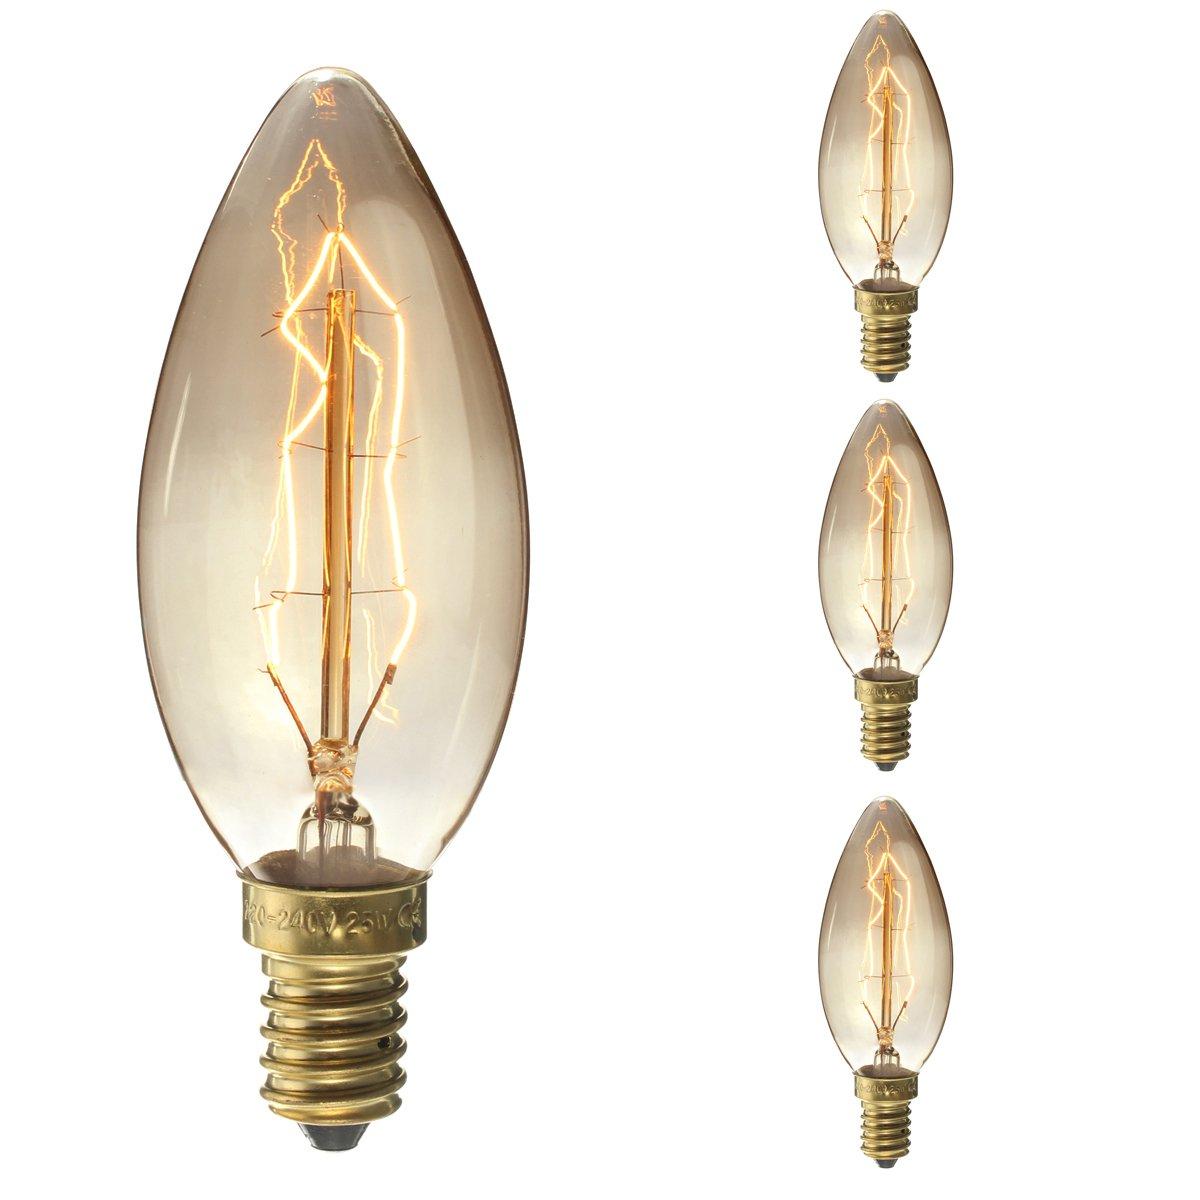 Lampadina a Candela, Elfeland Lampadina Vintage Retro Edison E14 Lampada Sospensione Filamento 25W Luce Bianco Caldo Illuminazione Luminosa 220V - 3 Pezzi